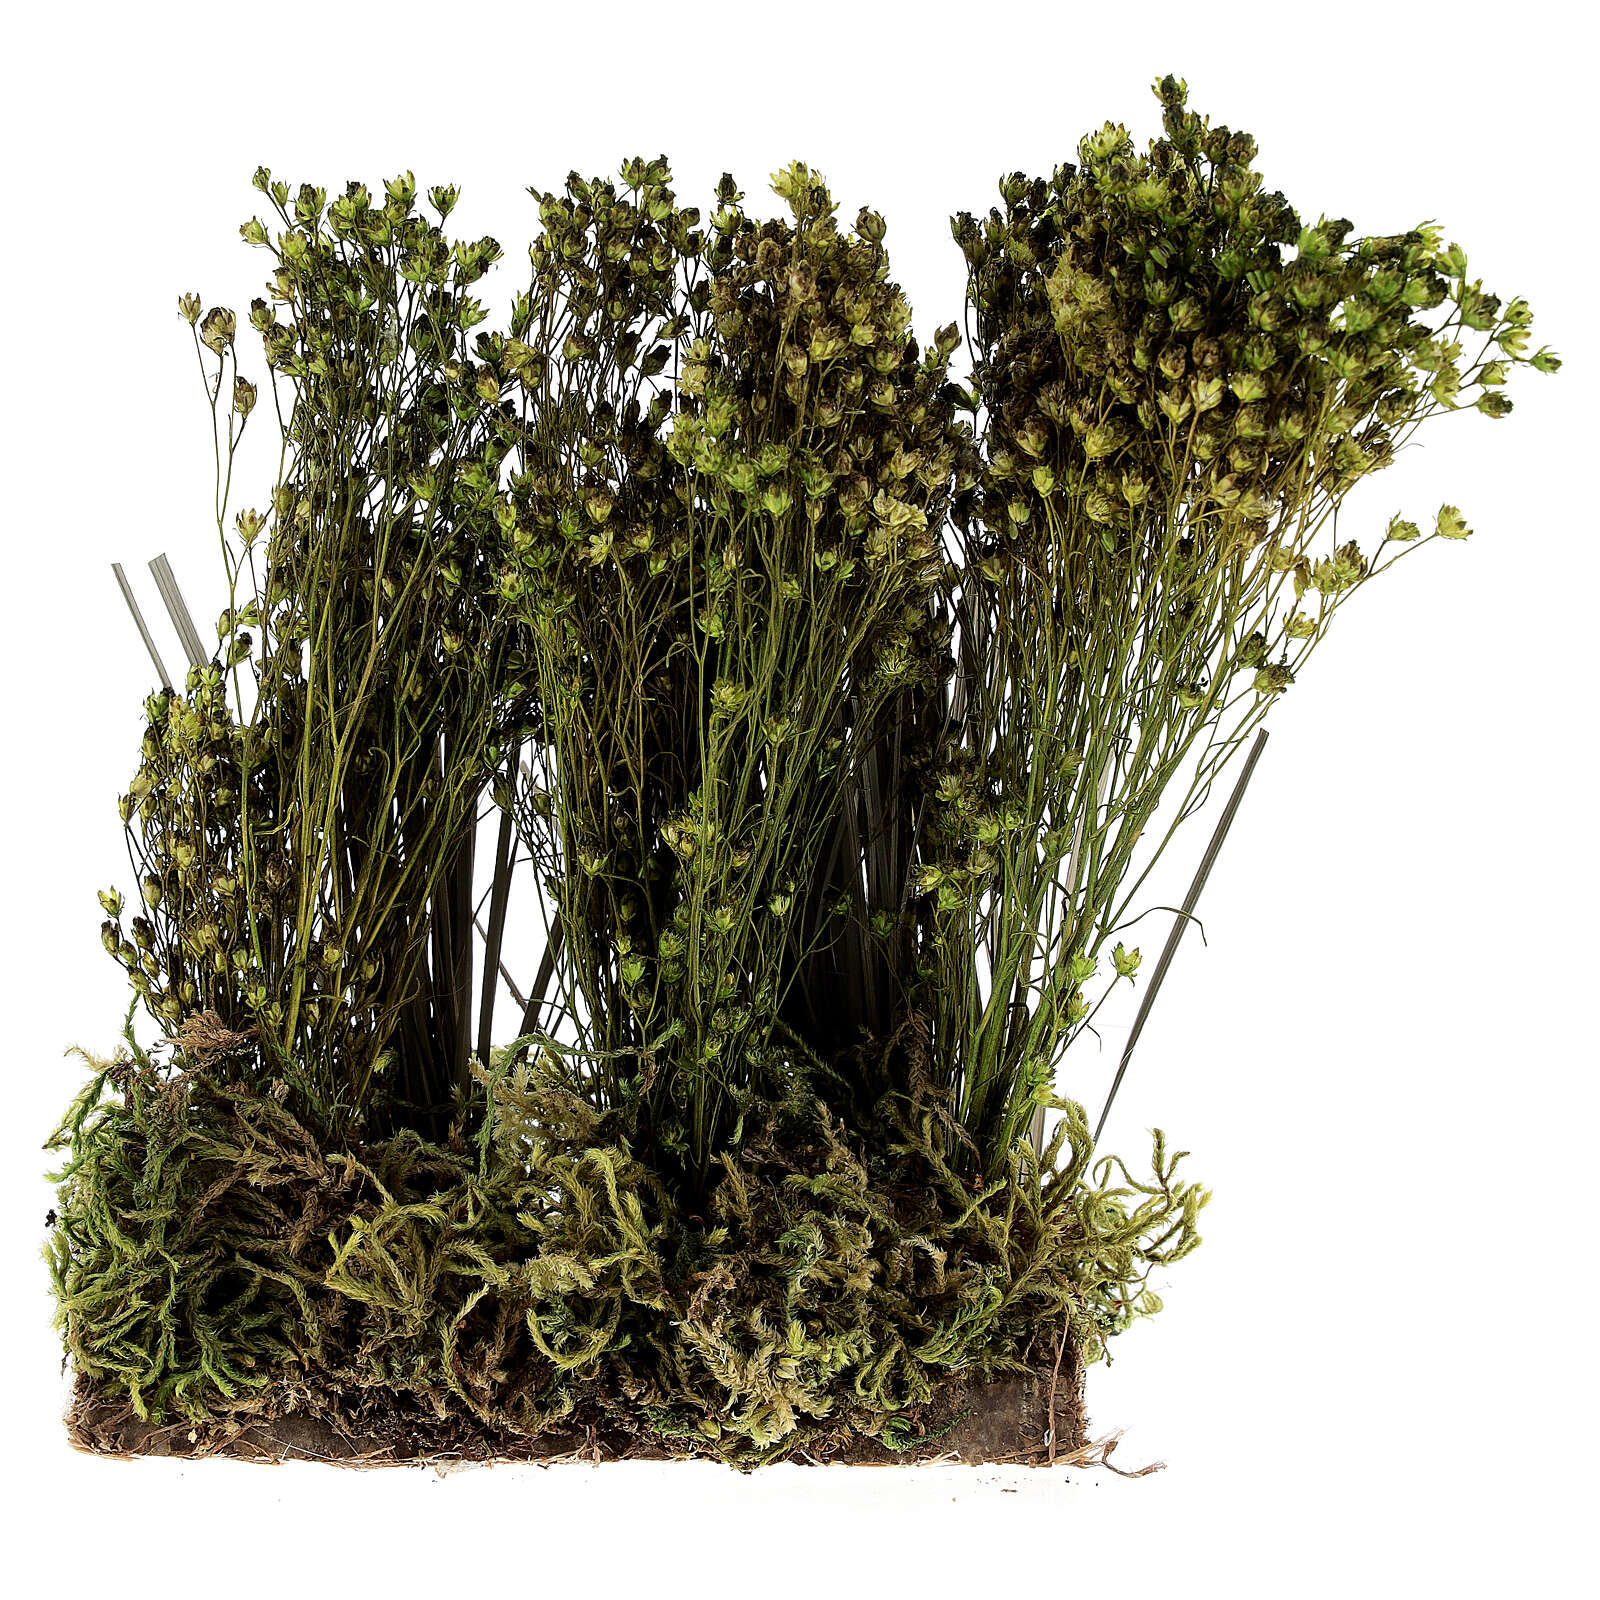 Arbusto para presépio 19x9x6 cm 4